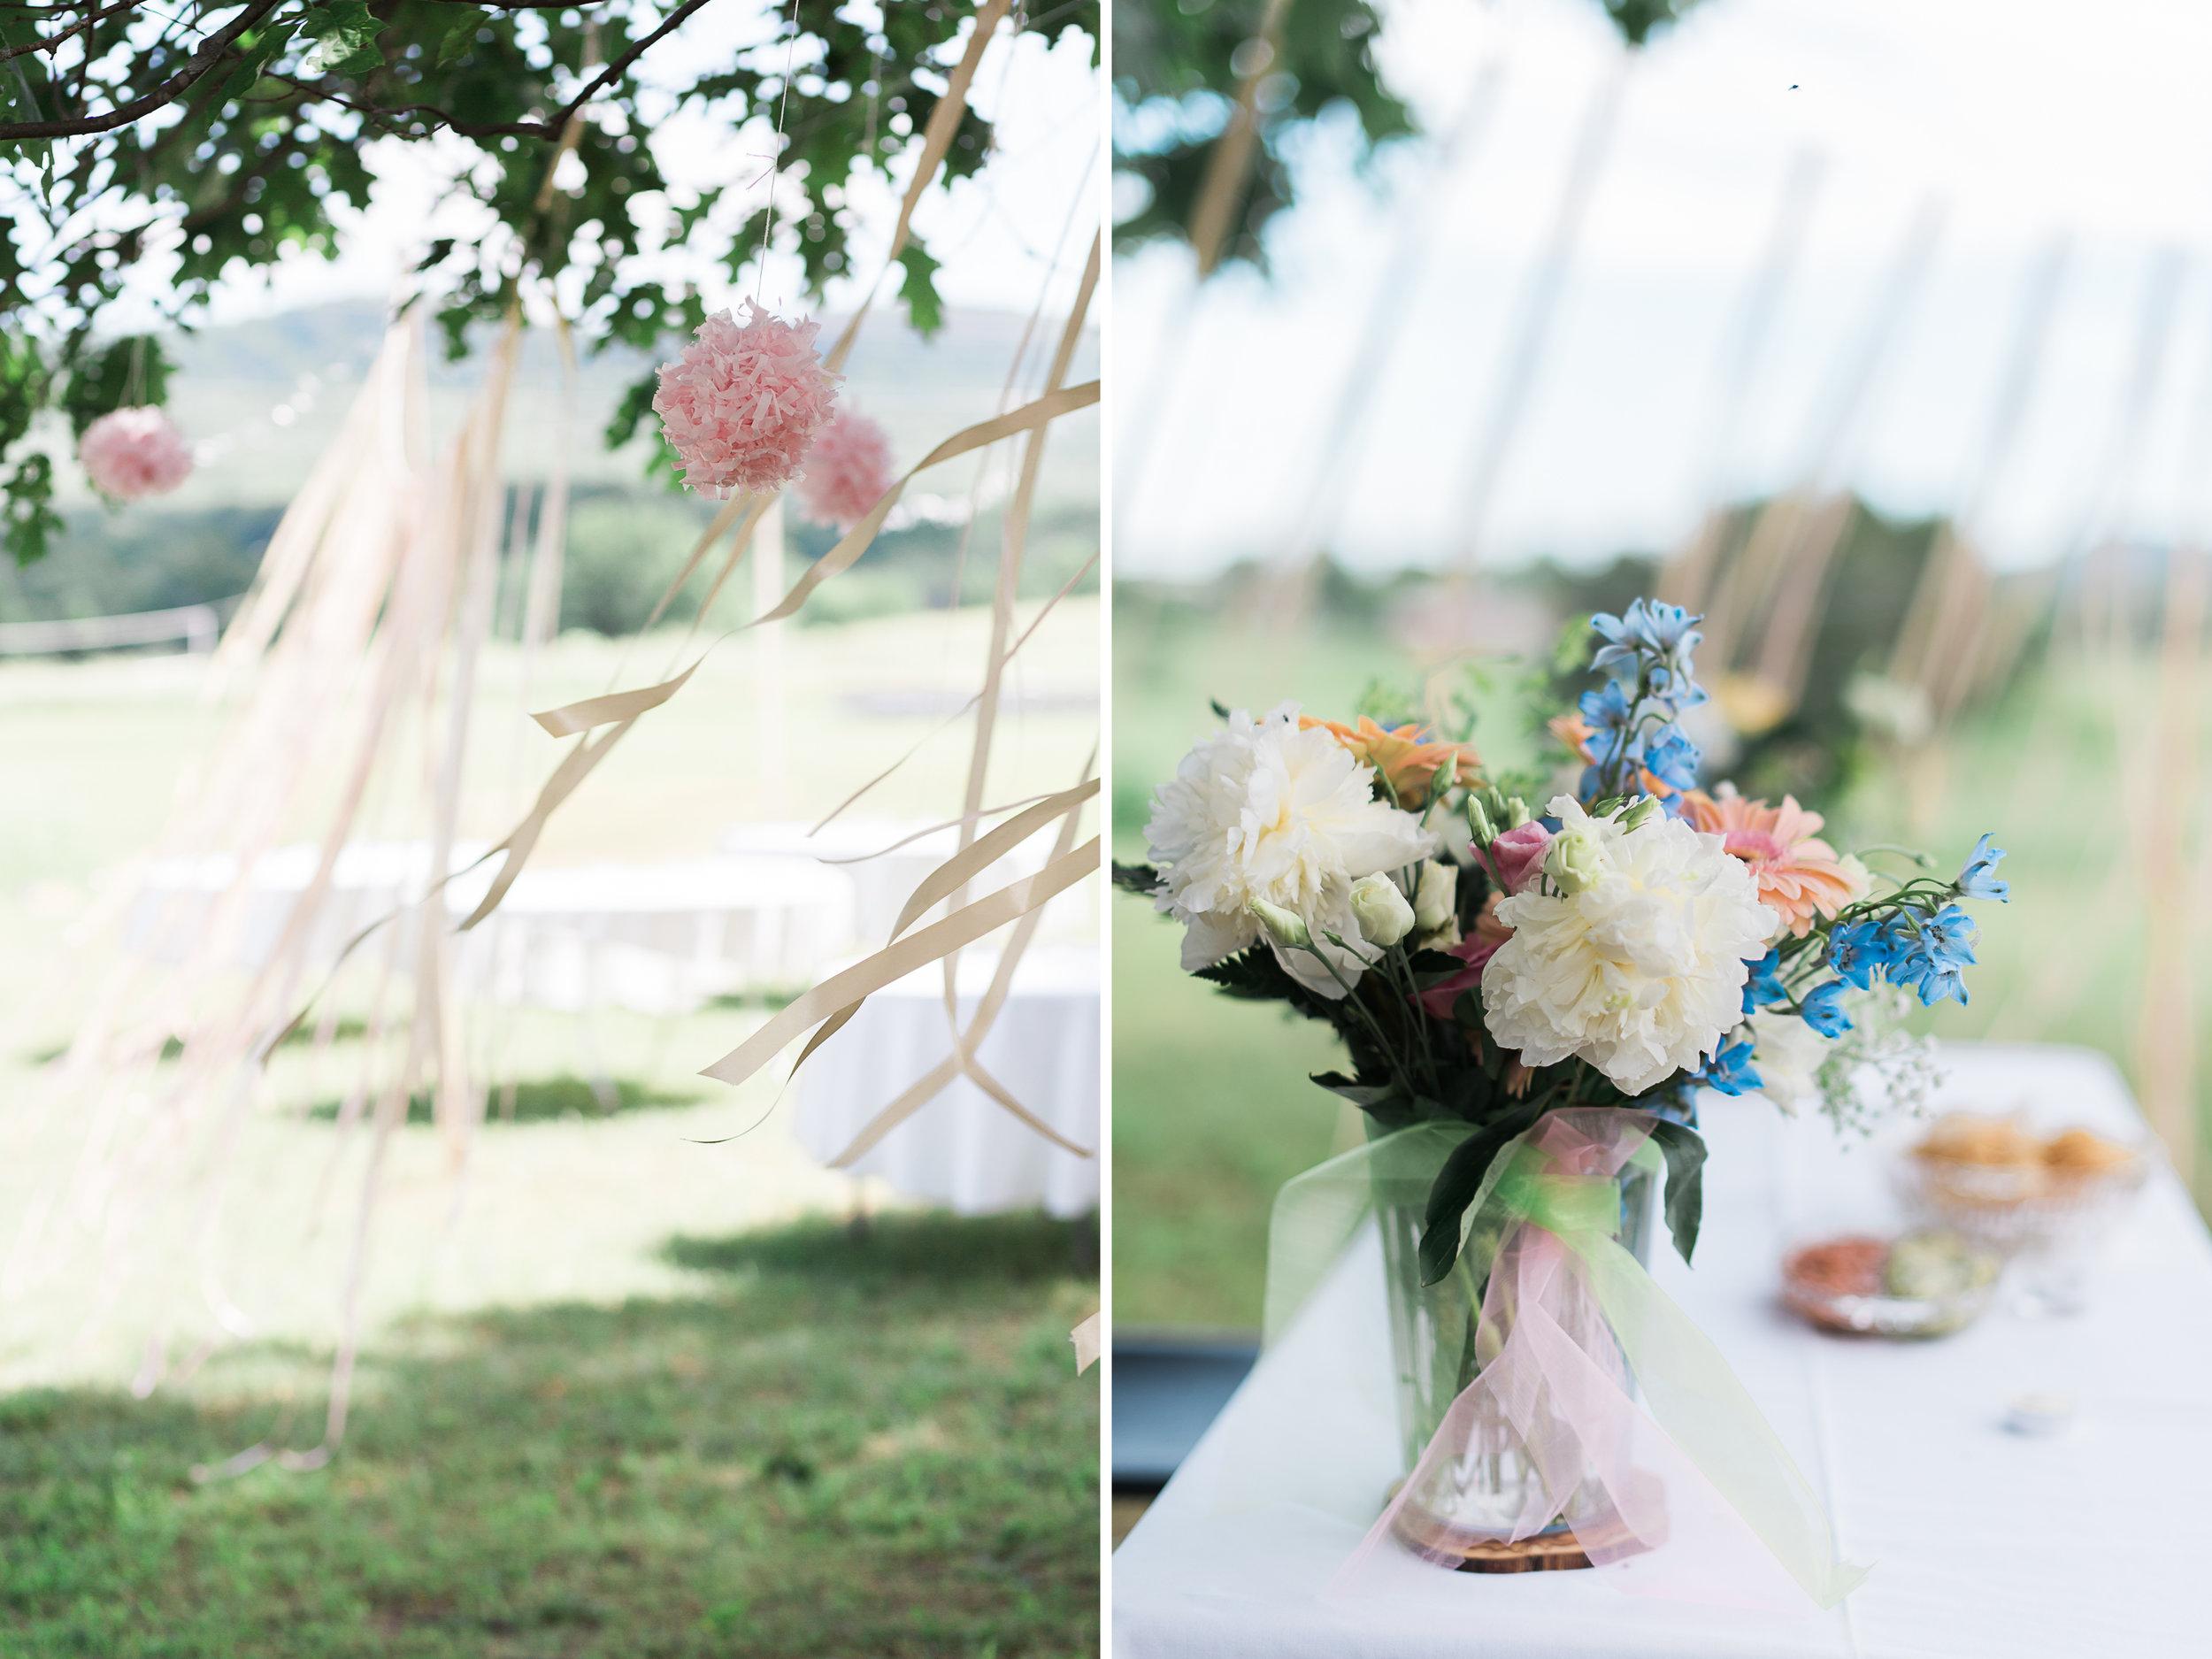 Backyard Wedding Photography in the Berkshires